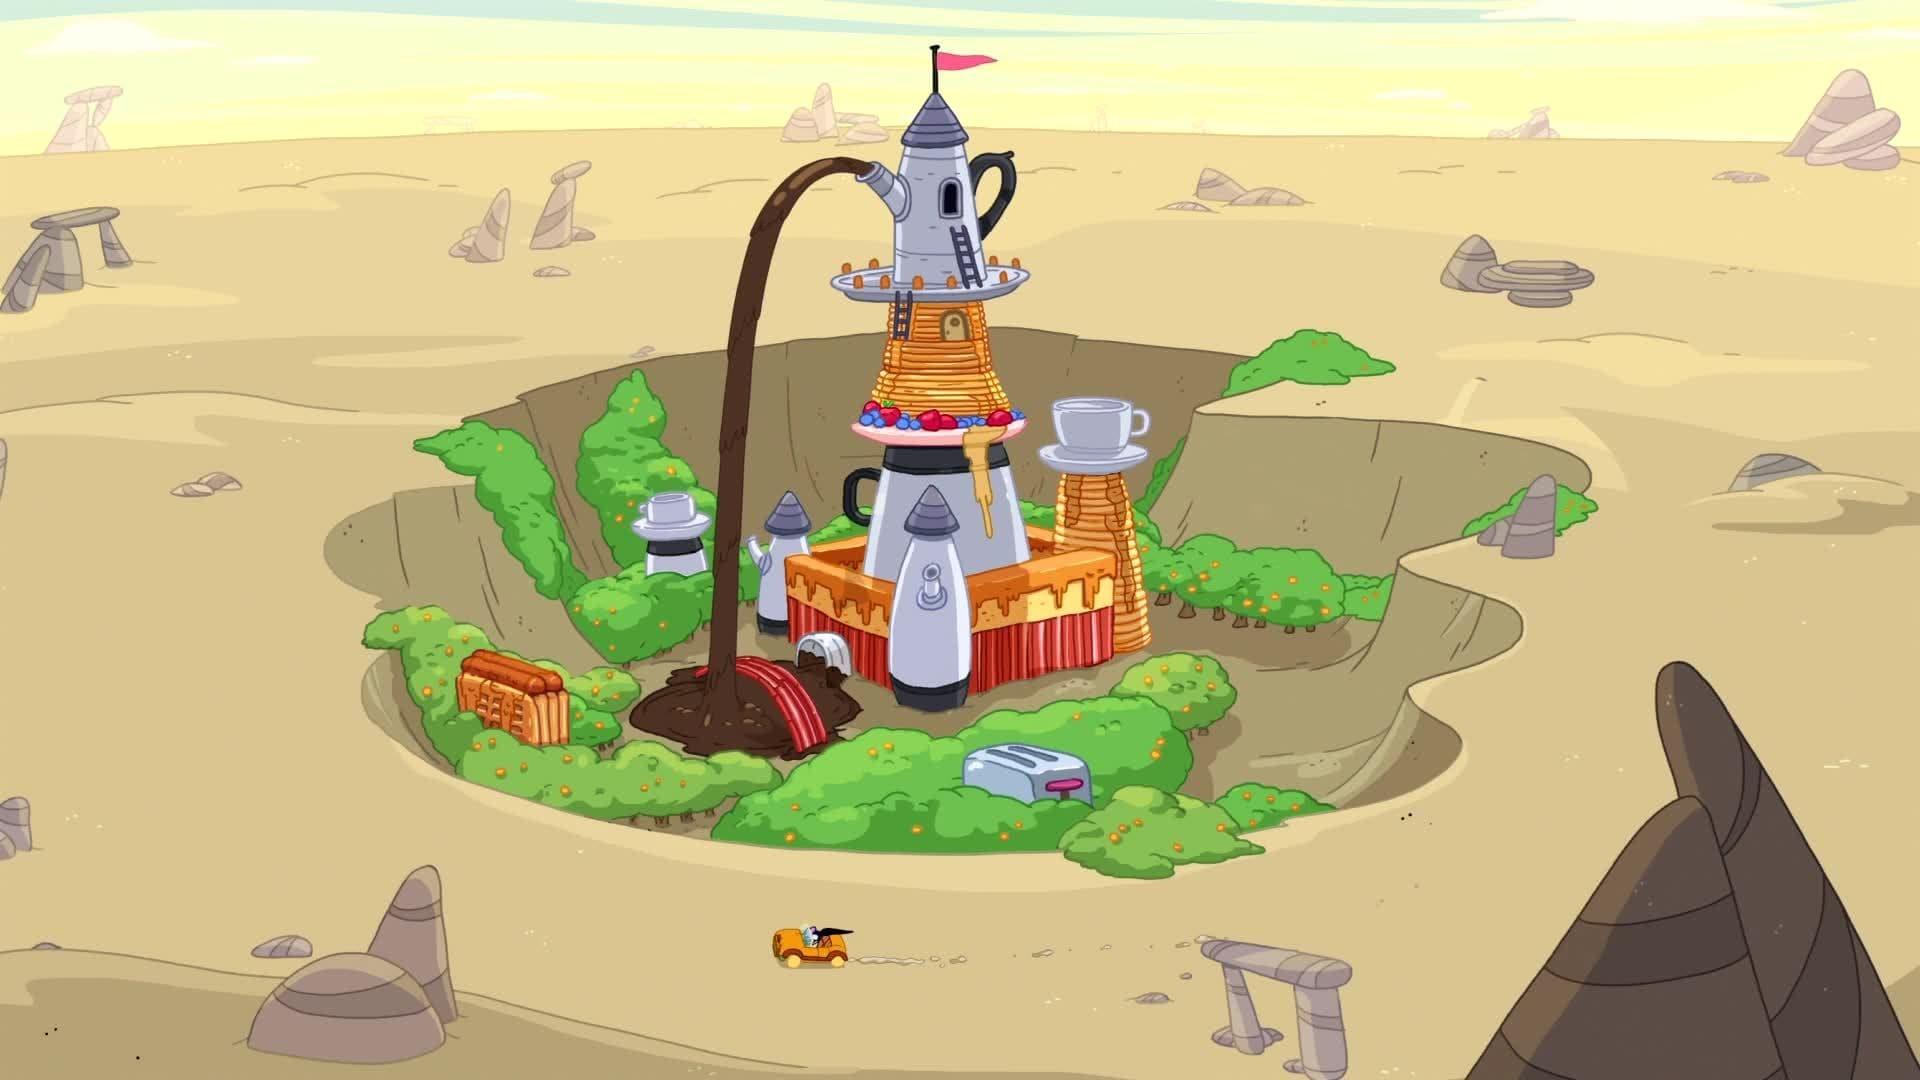 Adventure Time Princess Day adventure time: season 6-episode 14 openload free full